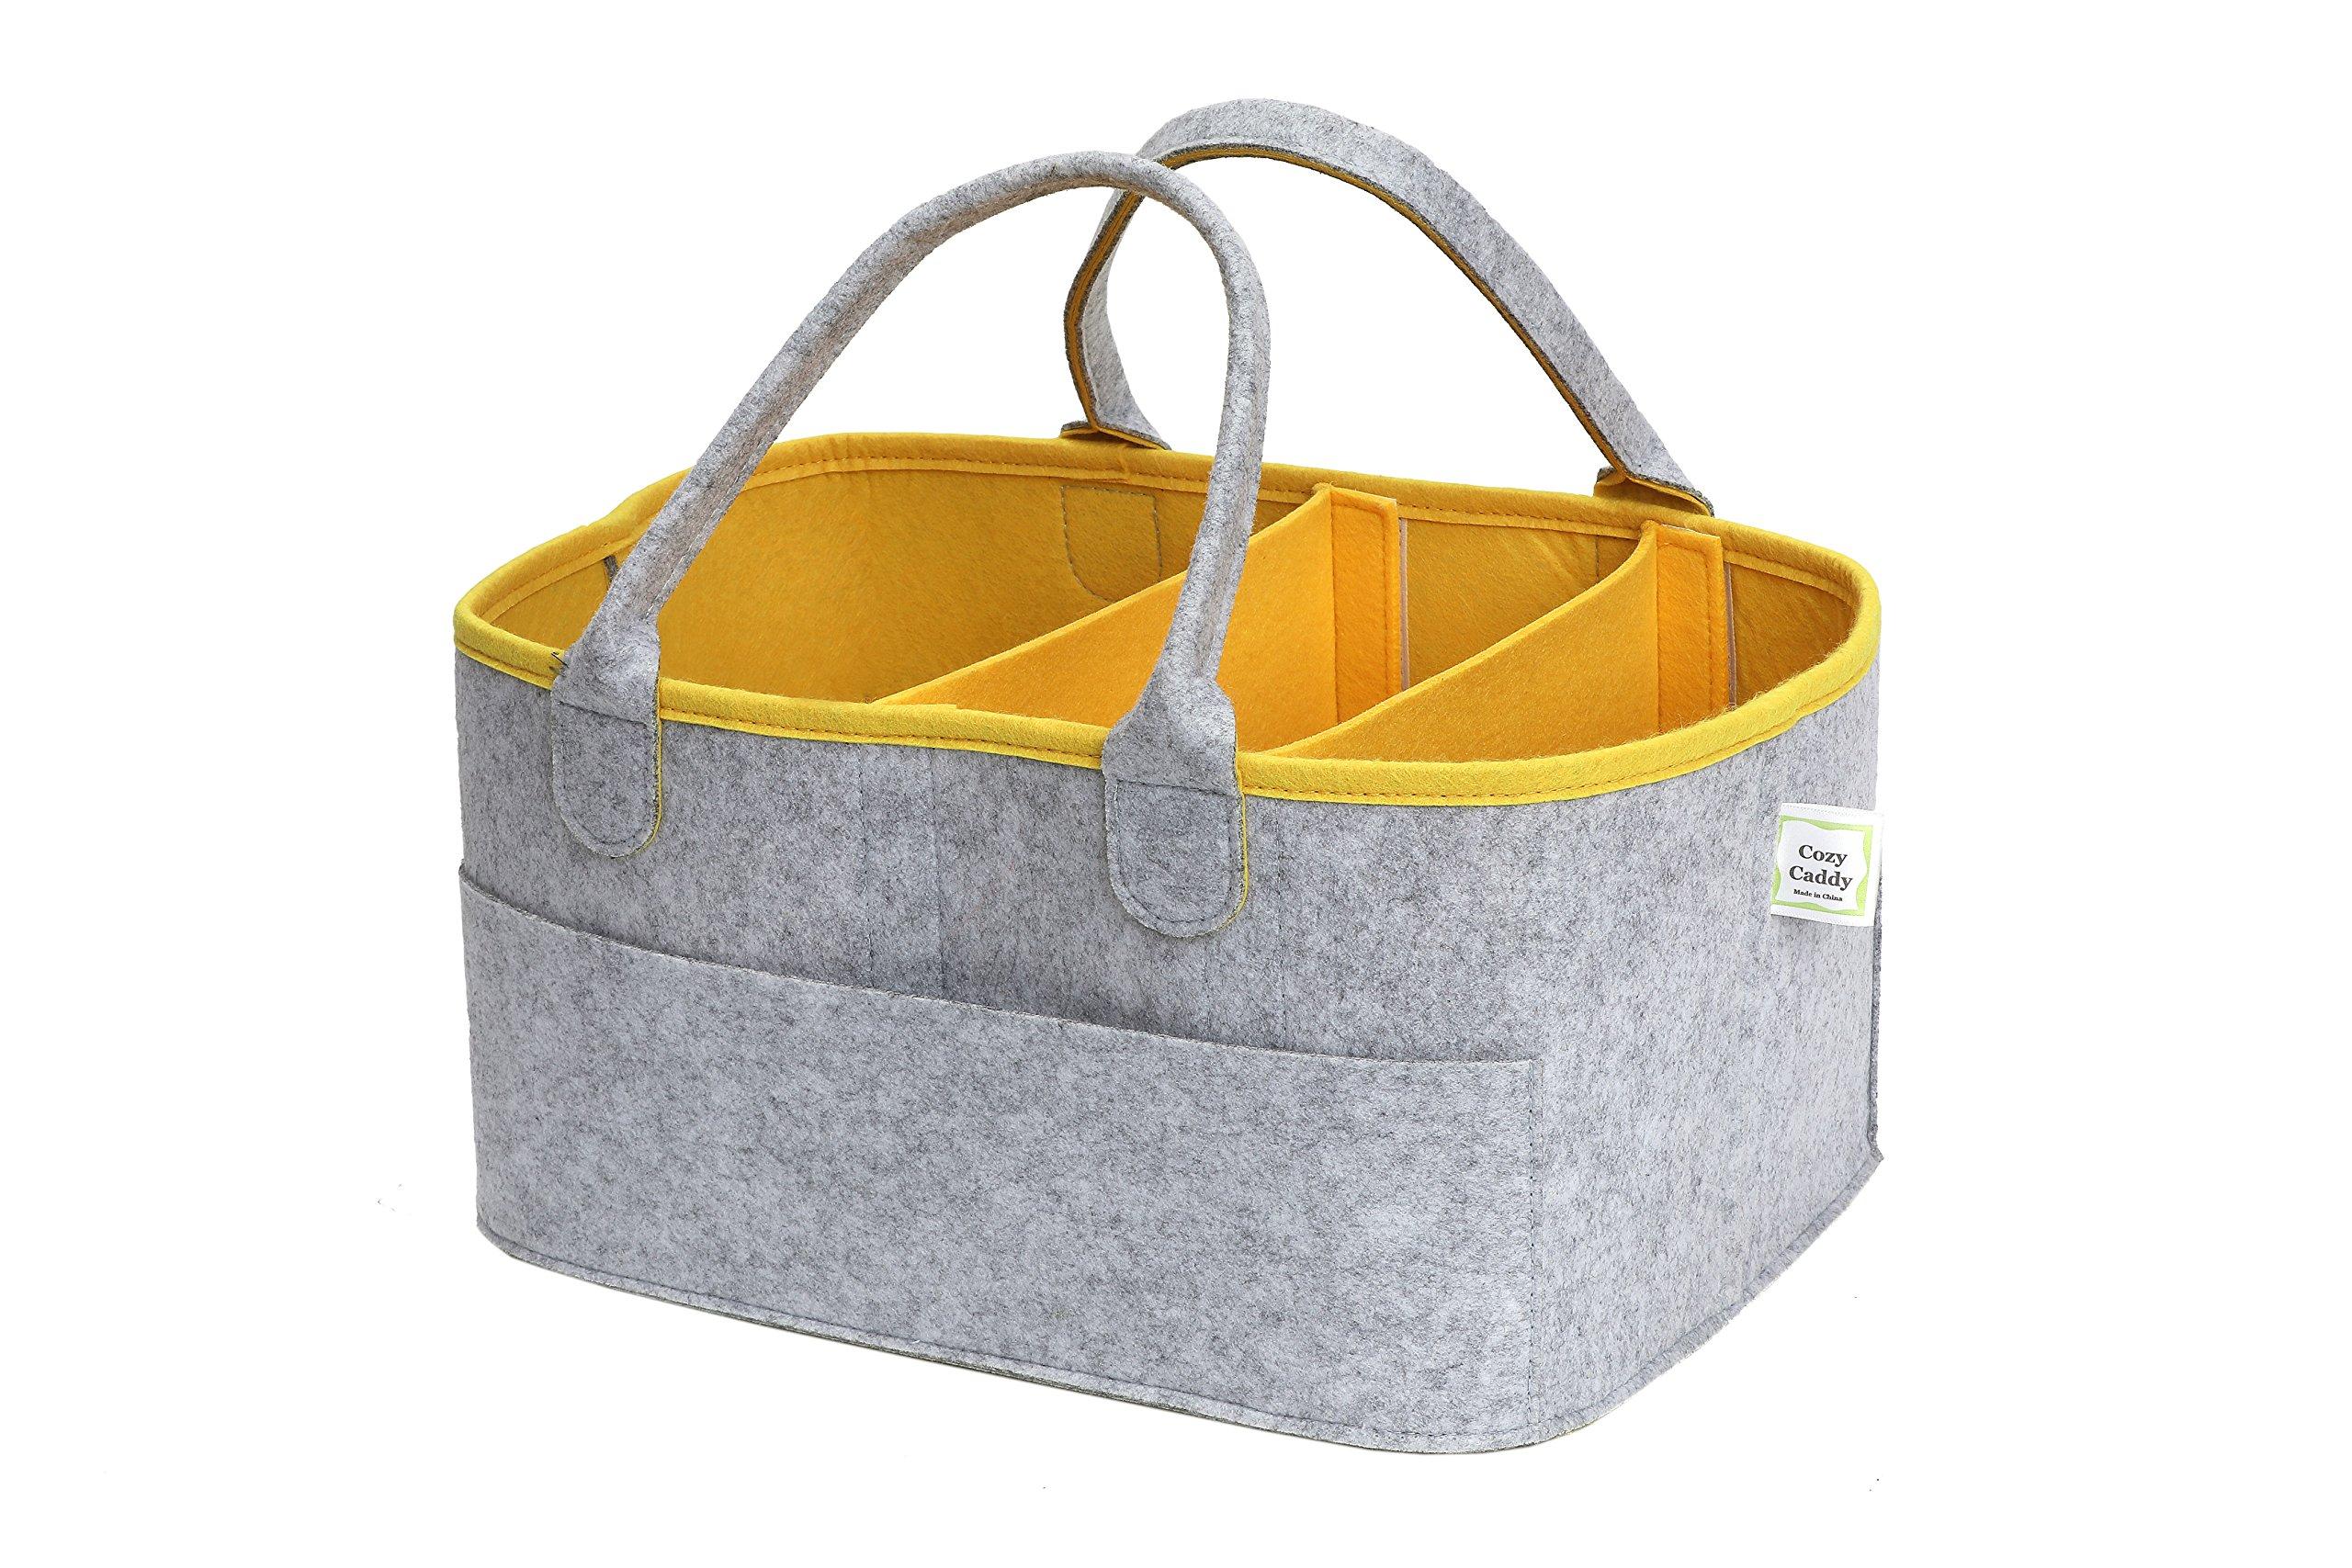 Amazoncom Cozycaddy Grey Diaper Caddy Store Clothes Teething